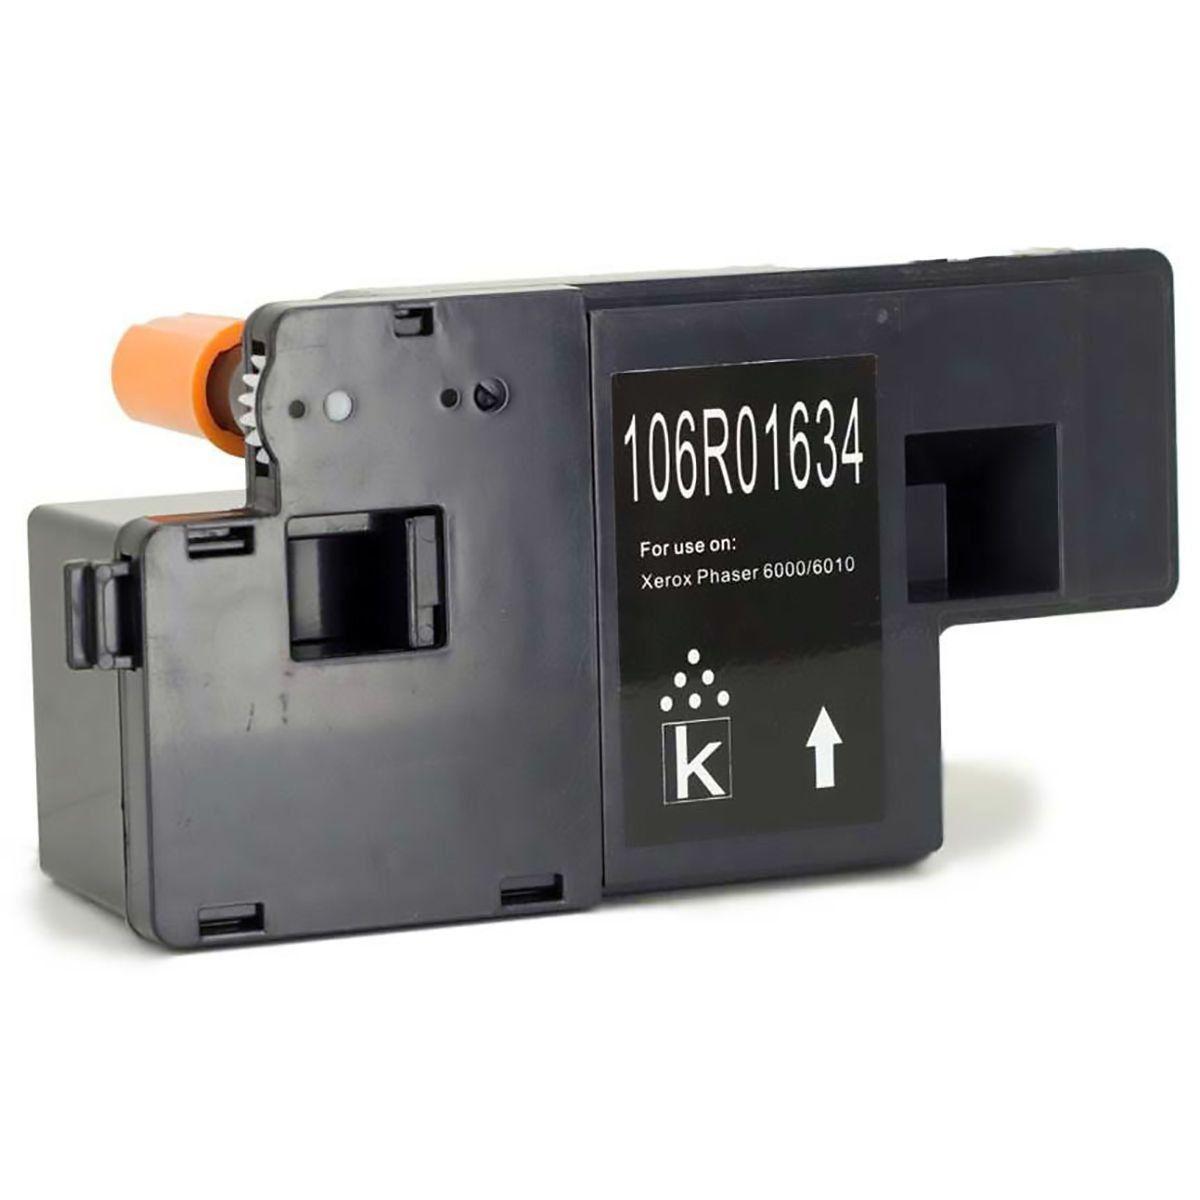 Compatível: Toner 106R01634 para Impressora Xerox Phaser 6000 6010 WorkCentre 6015 6015b 6015ni / Preto / 2.000